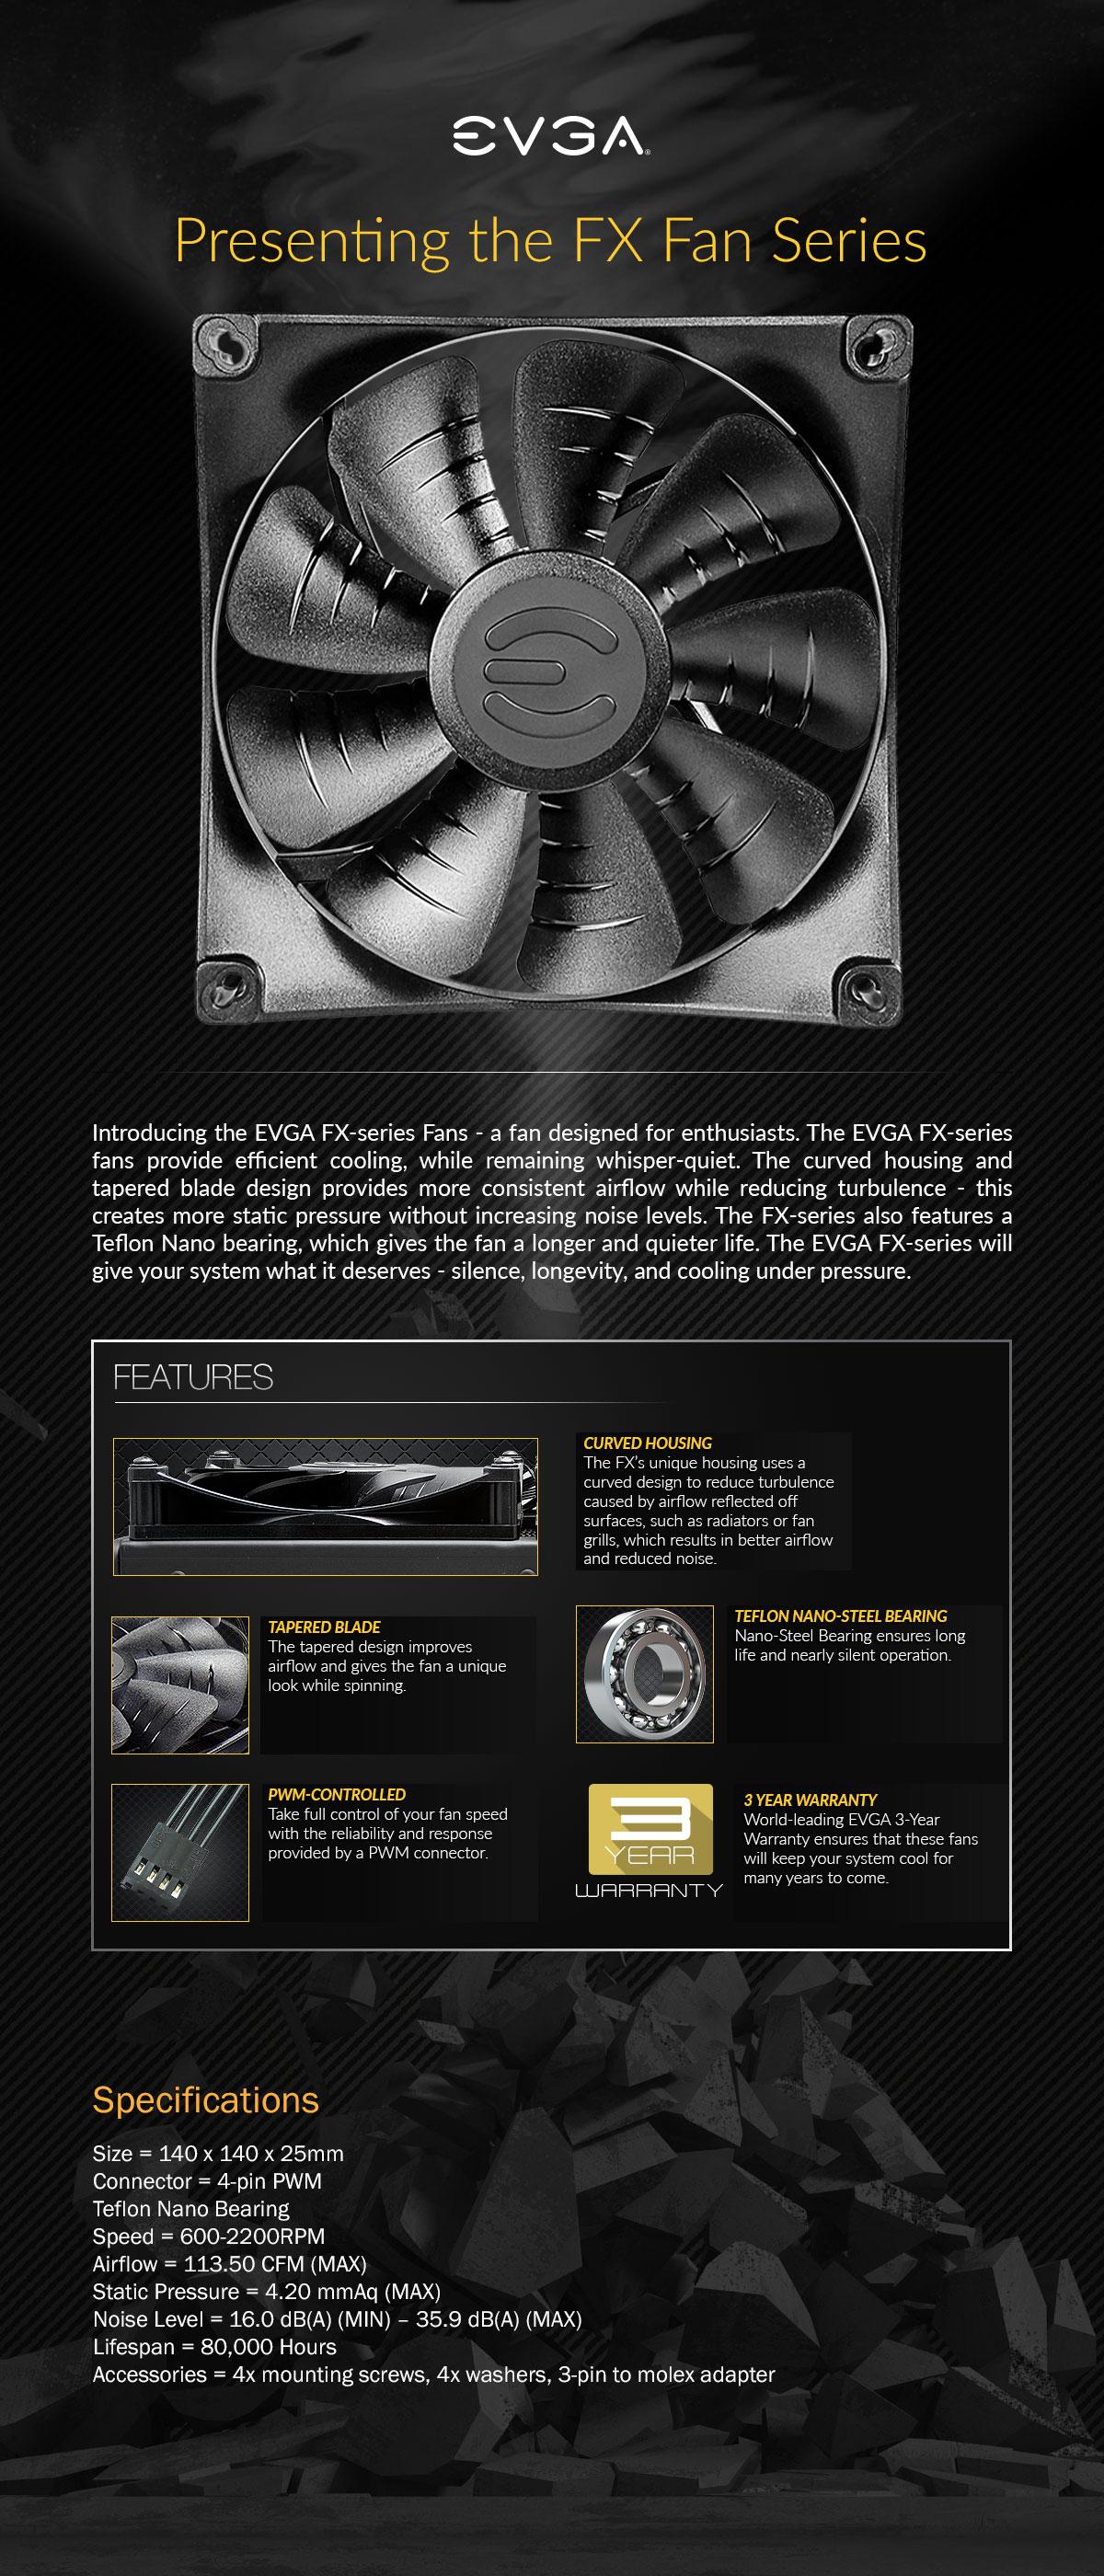 FX 140mm, 2200 RPM, 113 50 CFM, 35 9 dBA, Cooling Fan